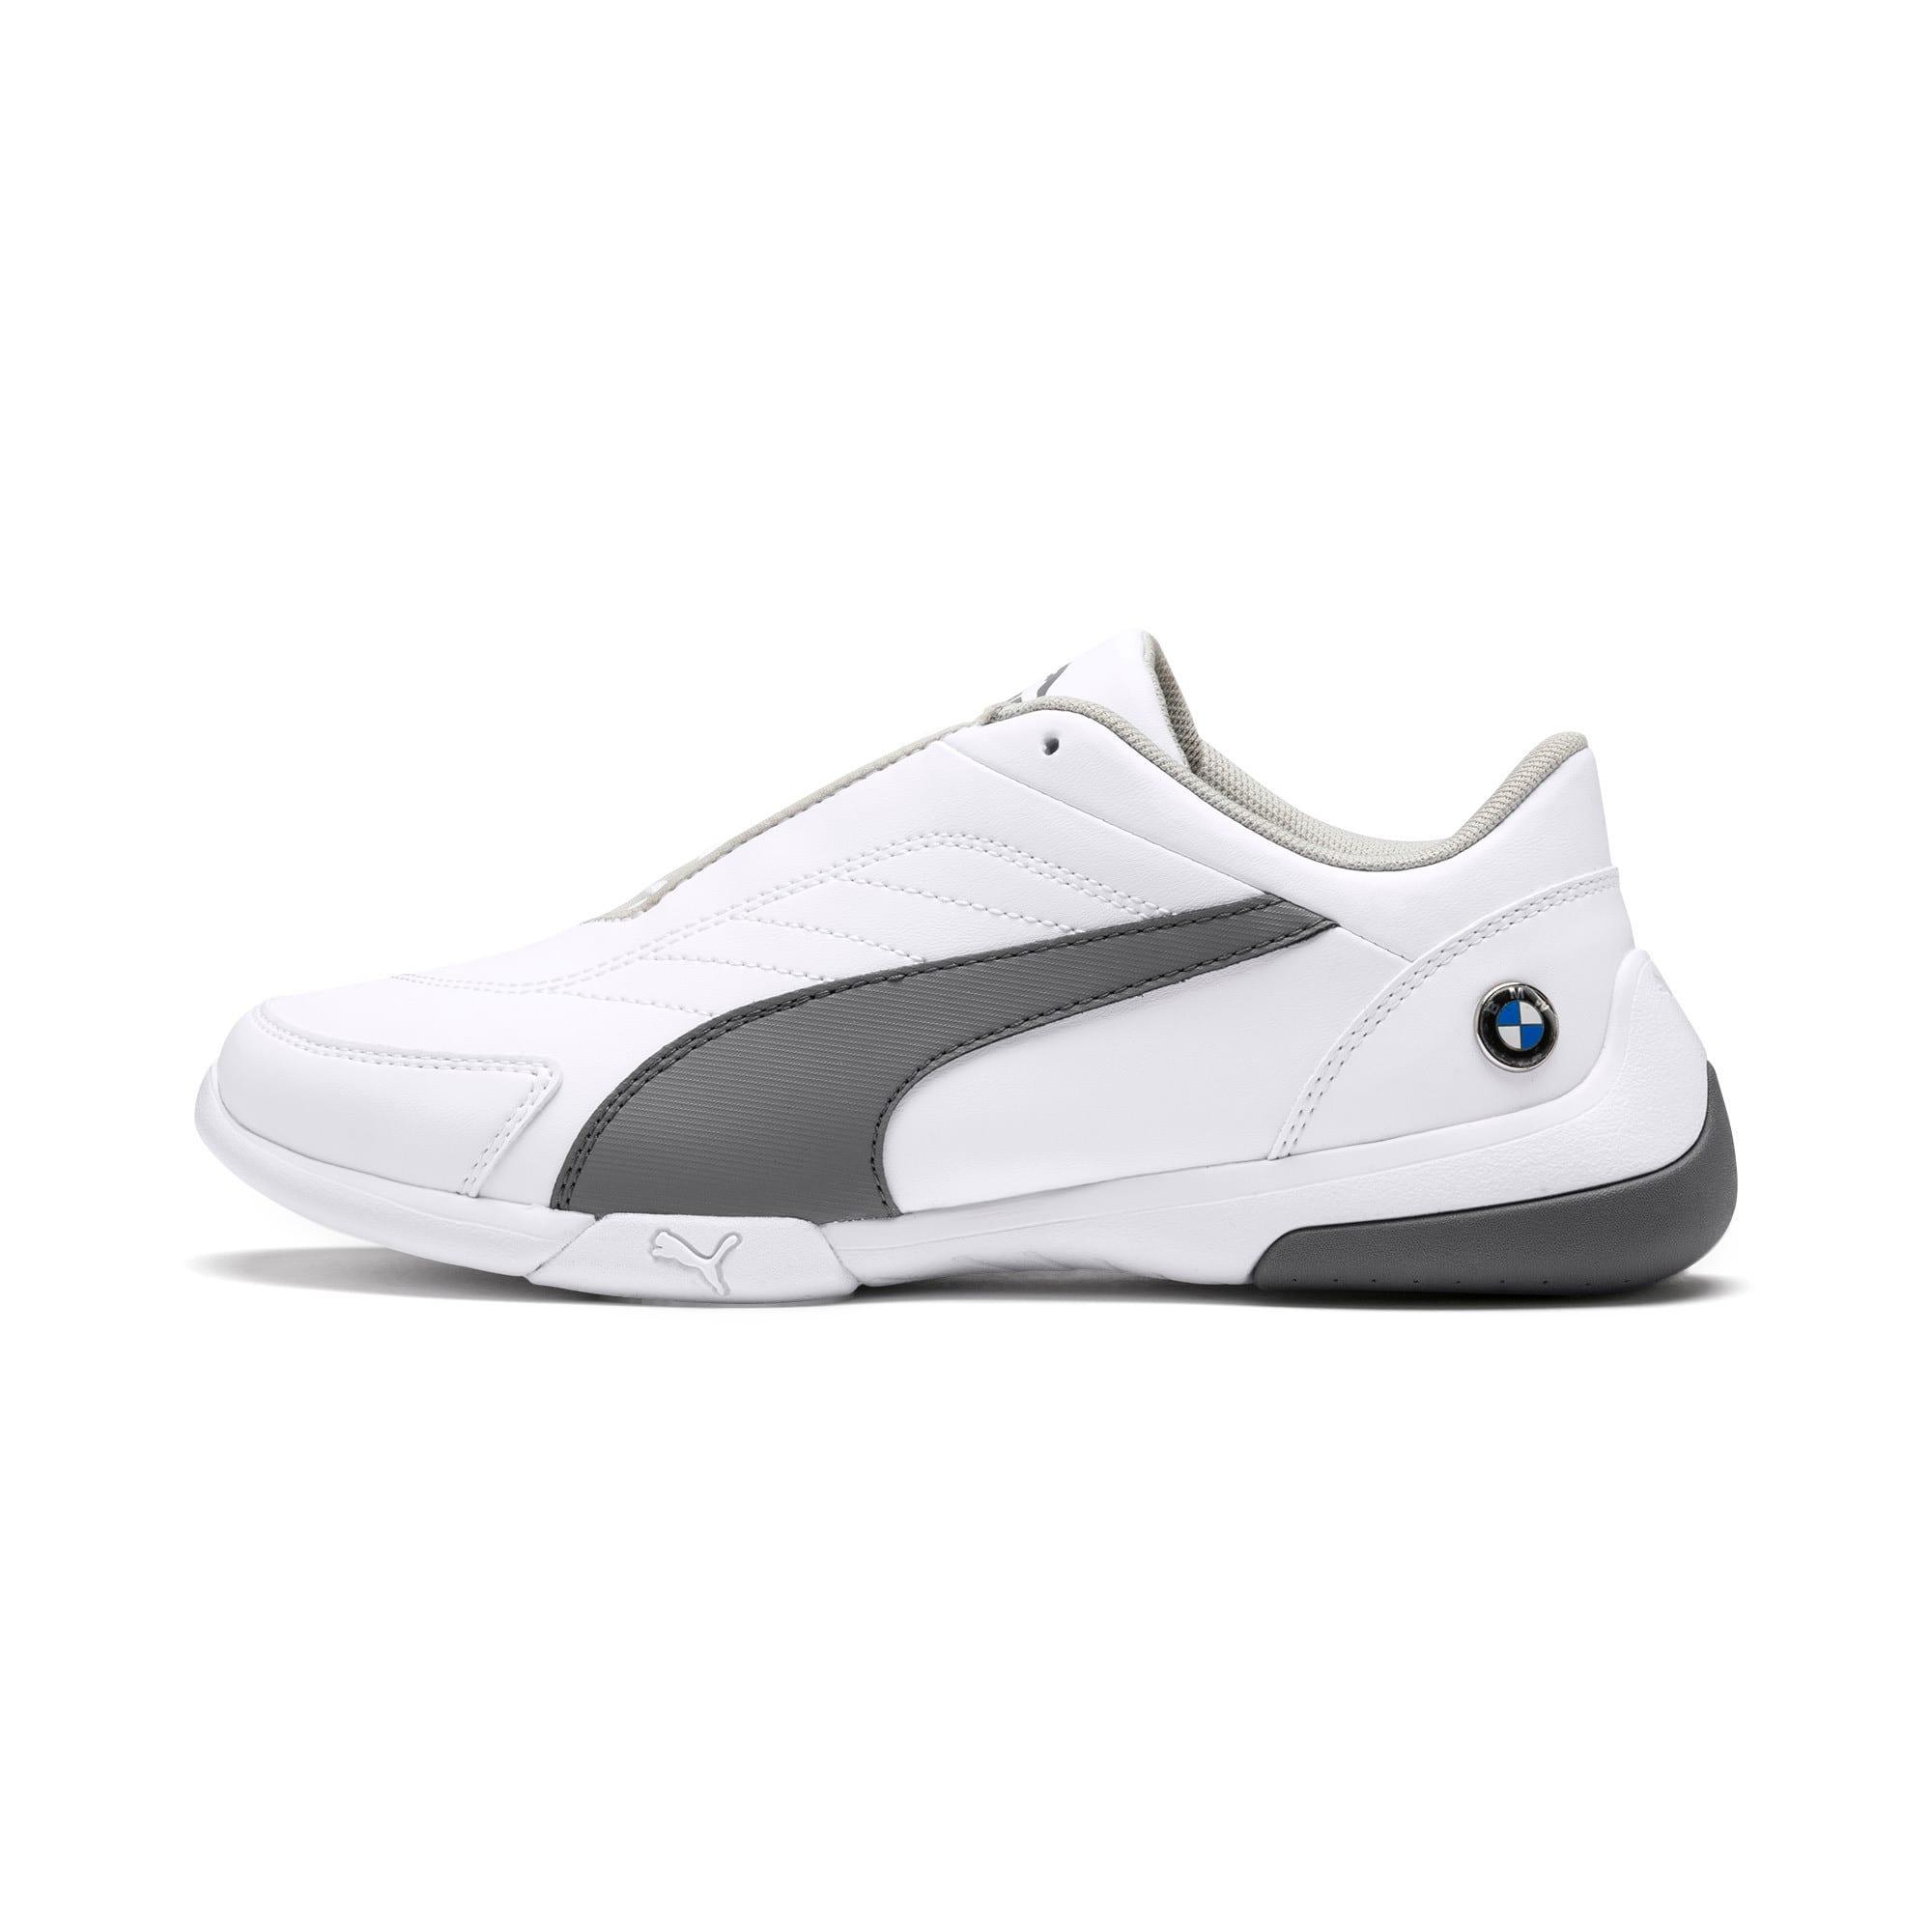 Thumbnail 1 of BMW MMS Kart Cat III Shoes JR, Puma White-Smoked Pearl, medium